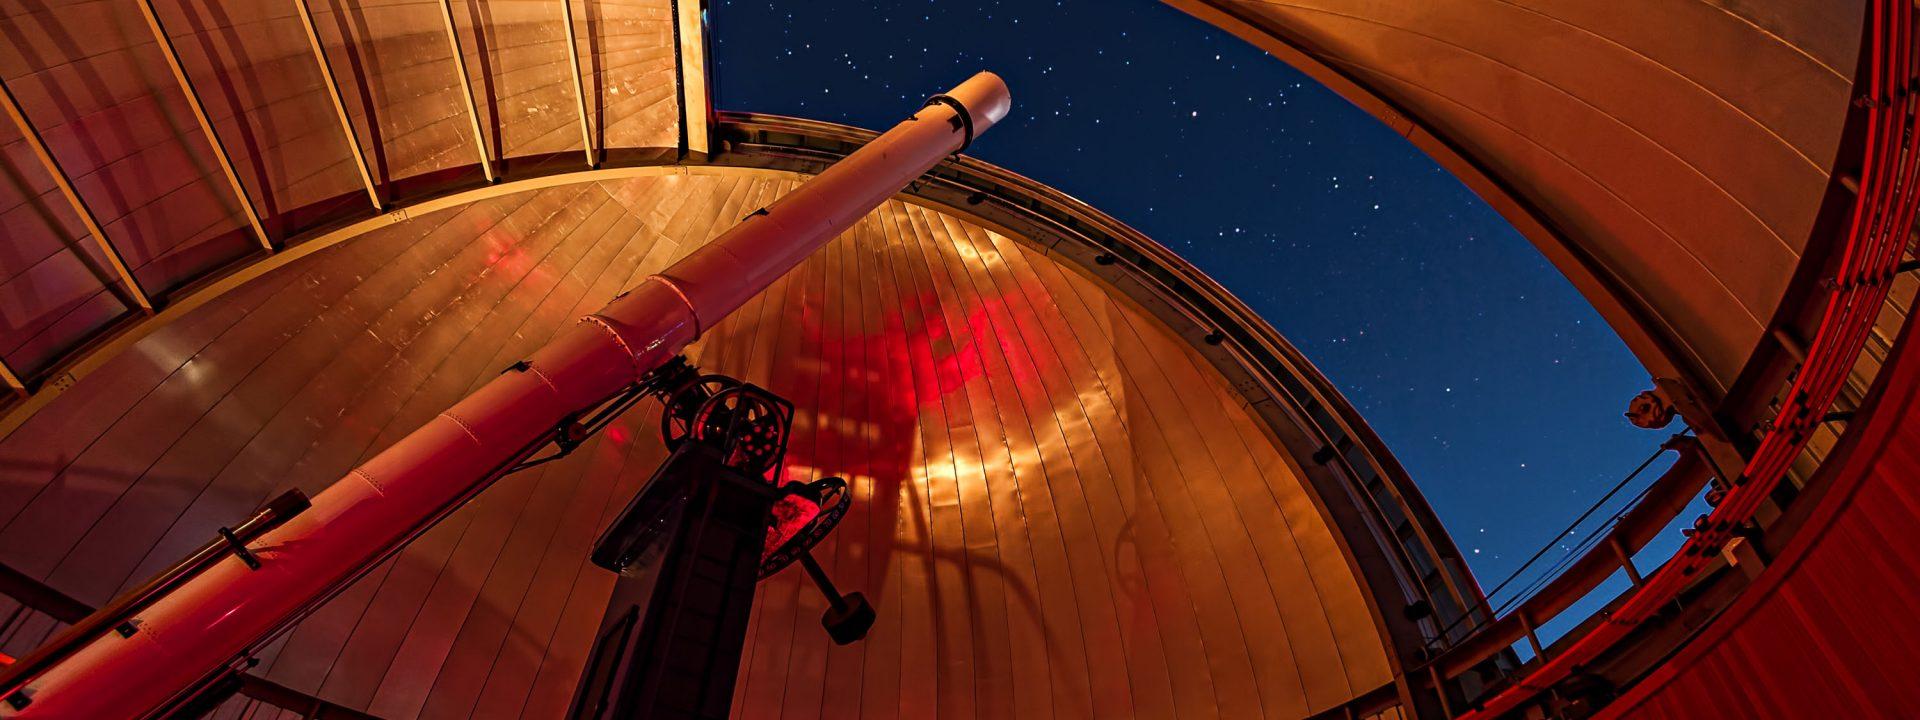 Telescope peering into the night sky